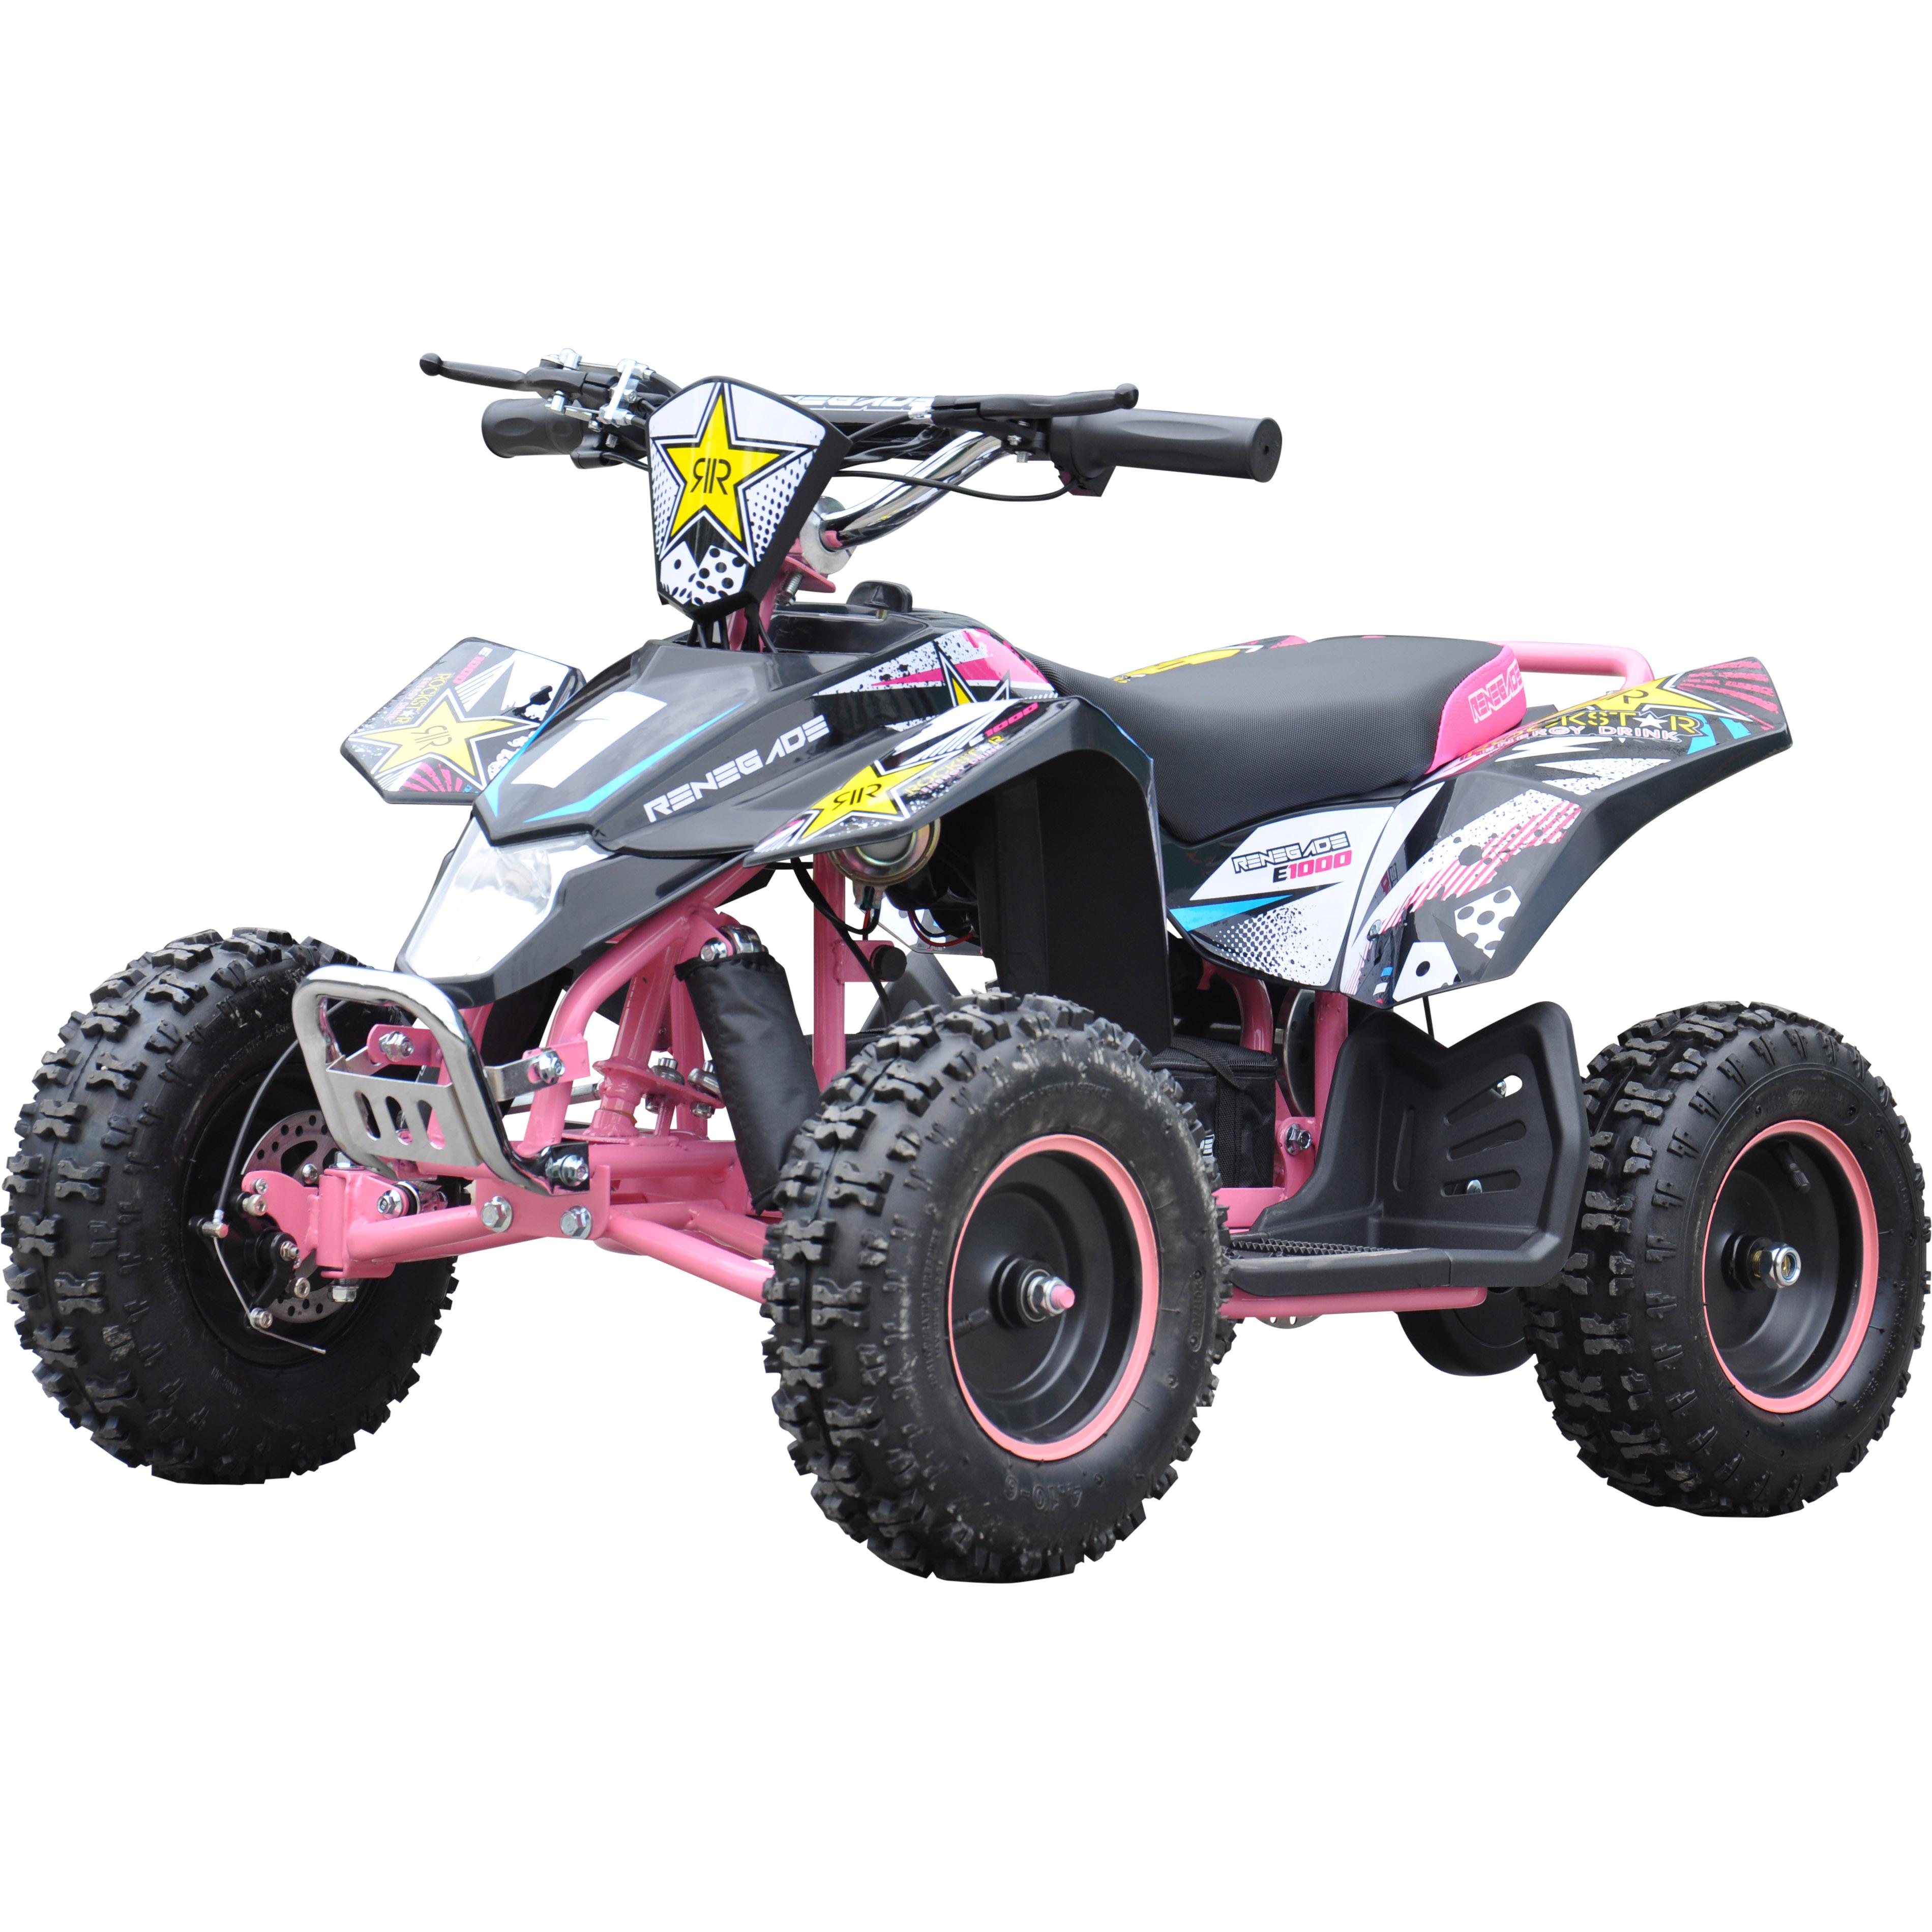 Uncategorized Pictures Of Quads ride on electric quads ebay renegade lt100e 36v battery 1000w mini quad bike atv 4 colours